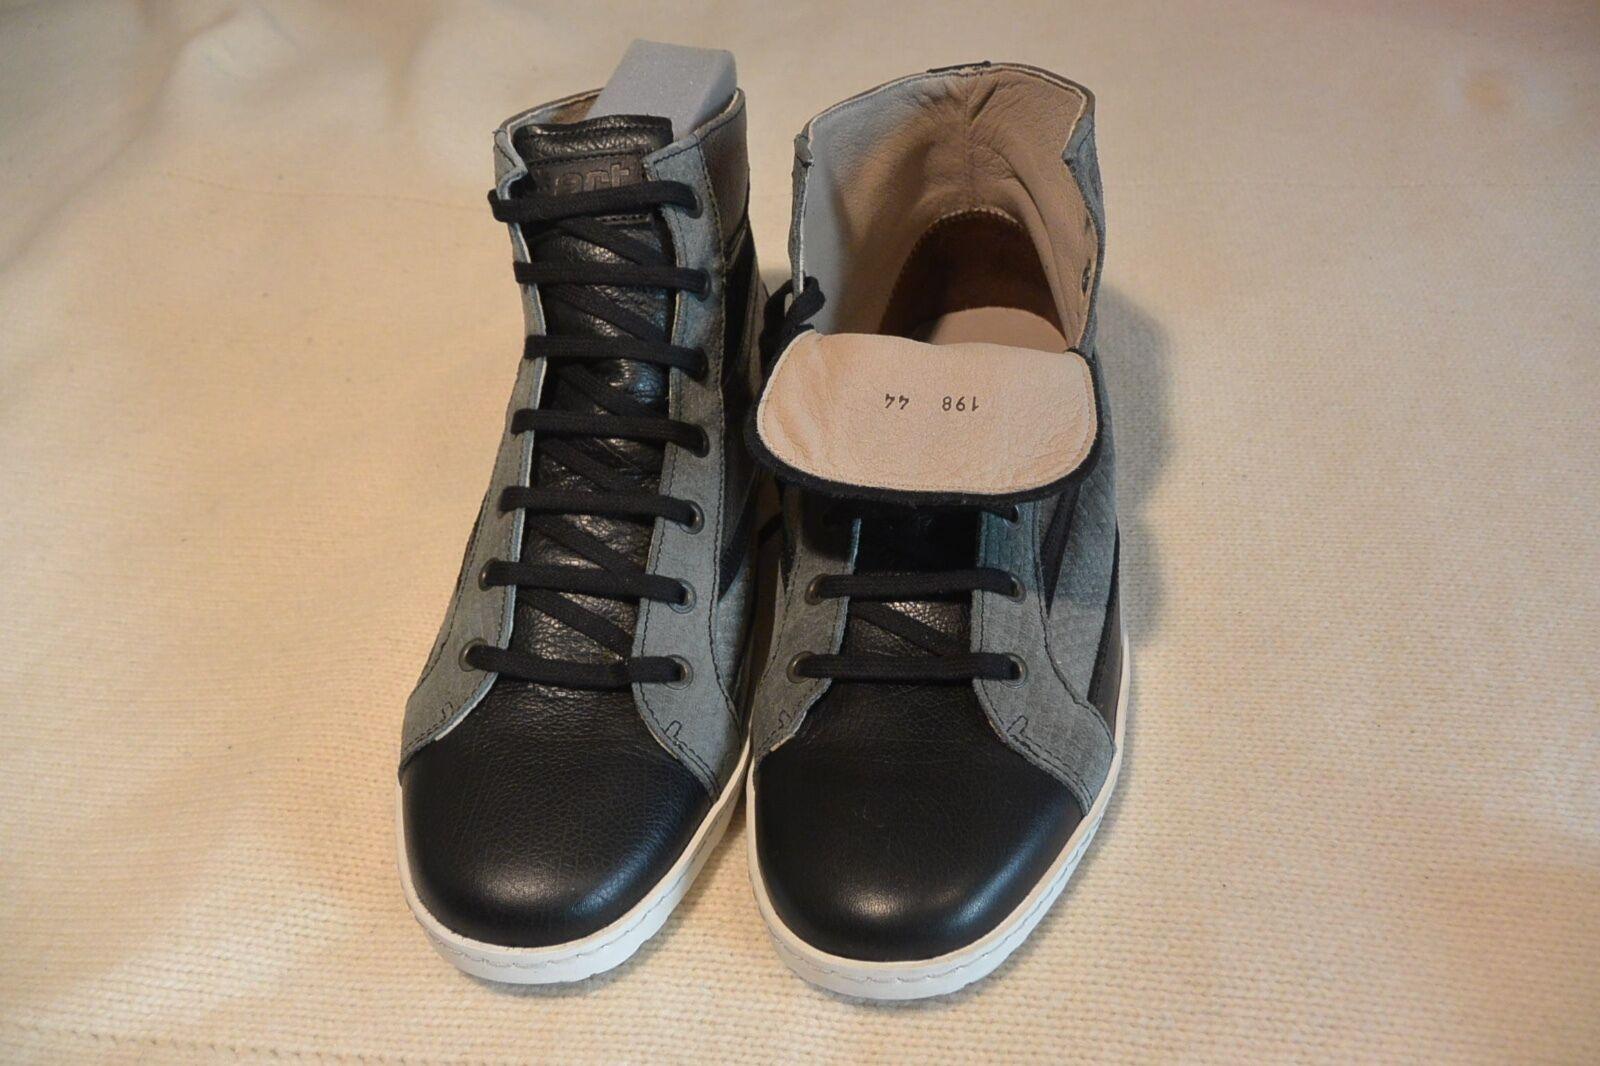 The ART Company GAUCHO-44 Schuhe  Stiefel Boots Echtleder BLACK